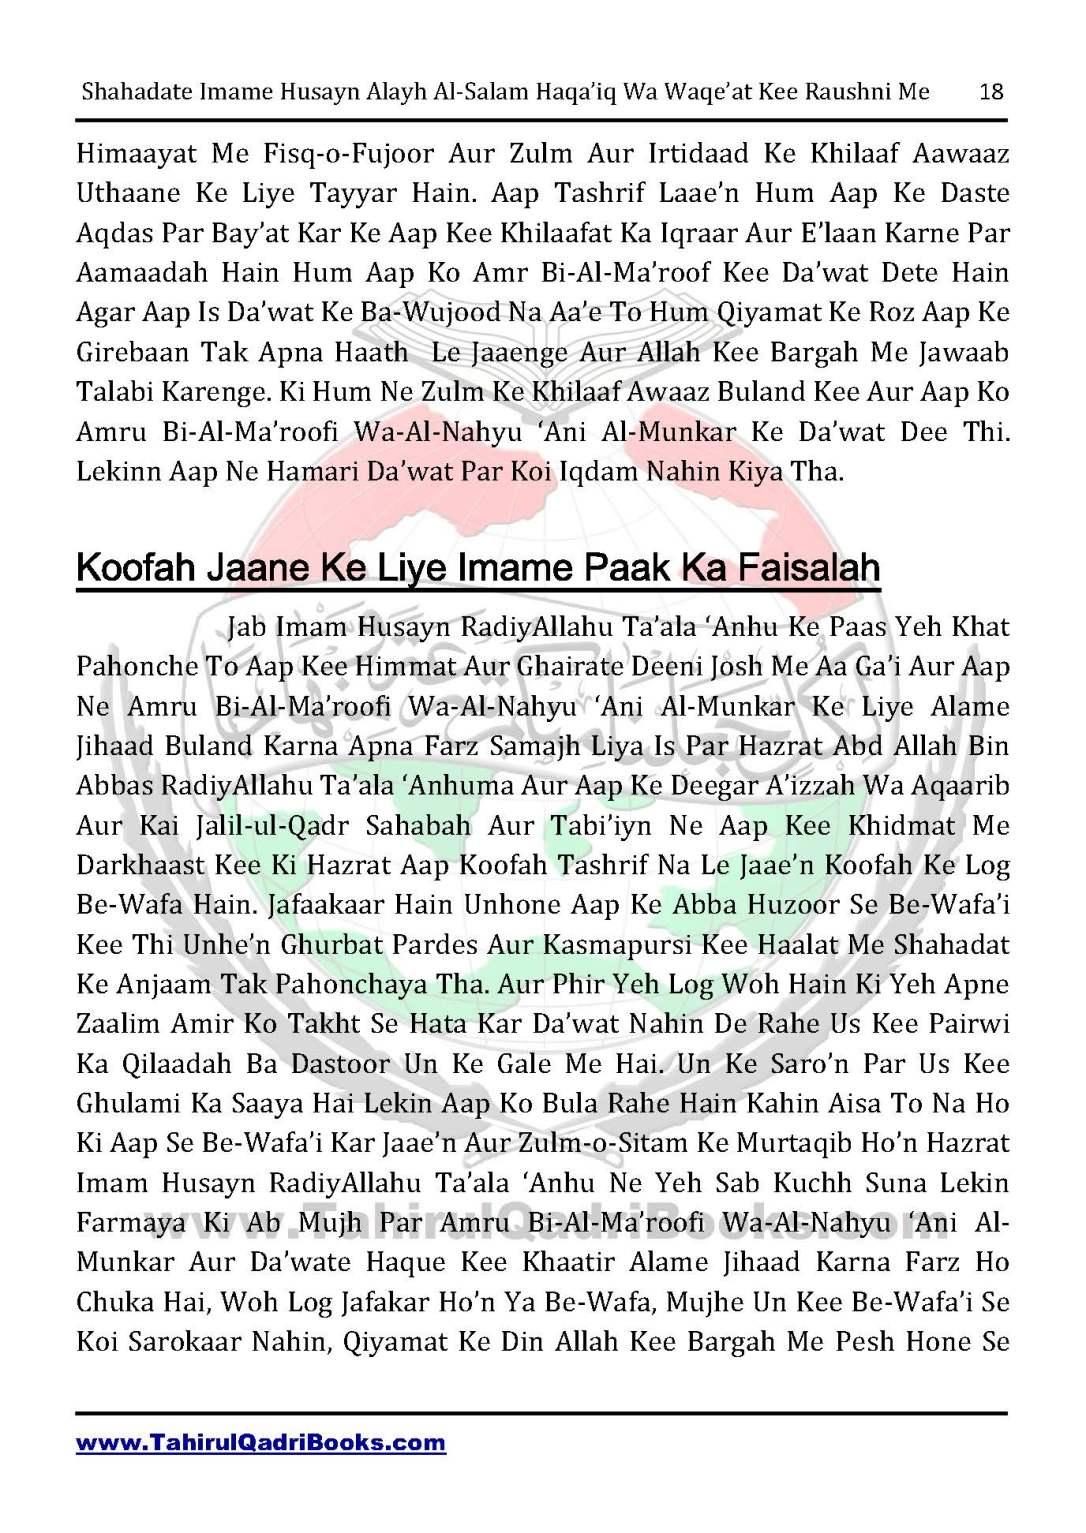 shahadate-imame-husayn-alayh-is-salam-haqaiq-wa-waqe_at-kee-raushni-me-in-roman-urdu-unlocked_Page_18